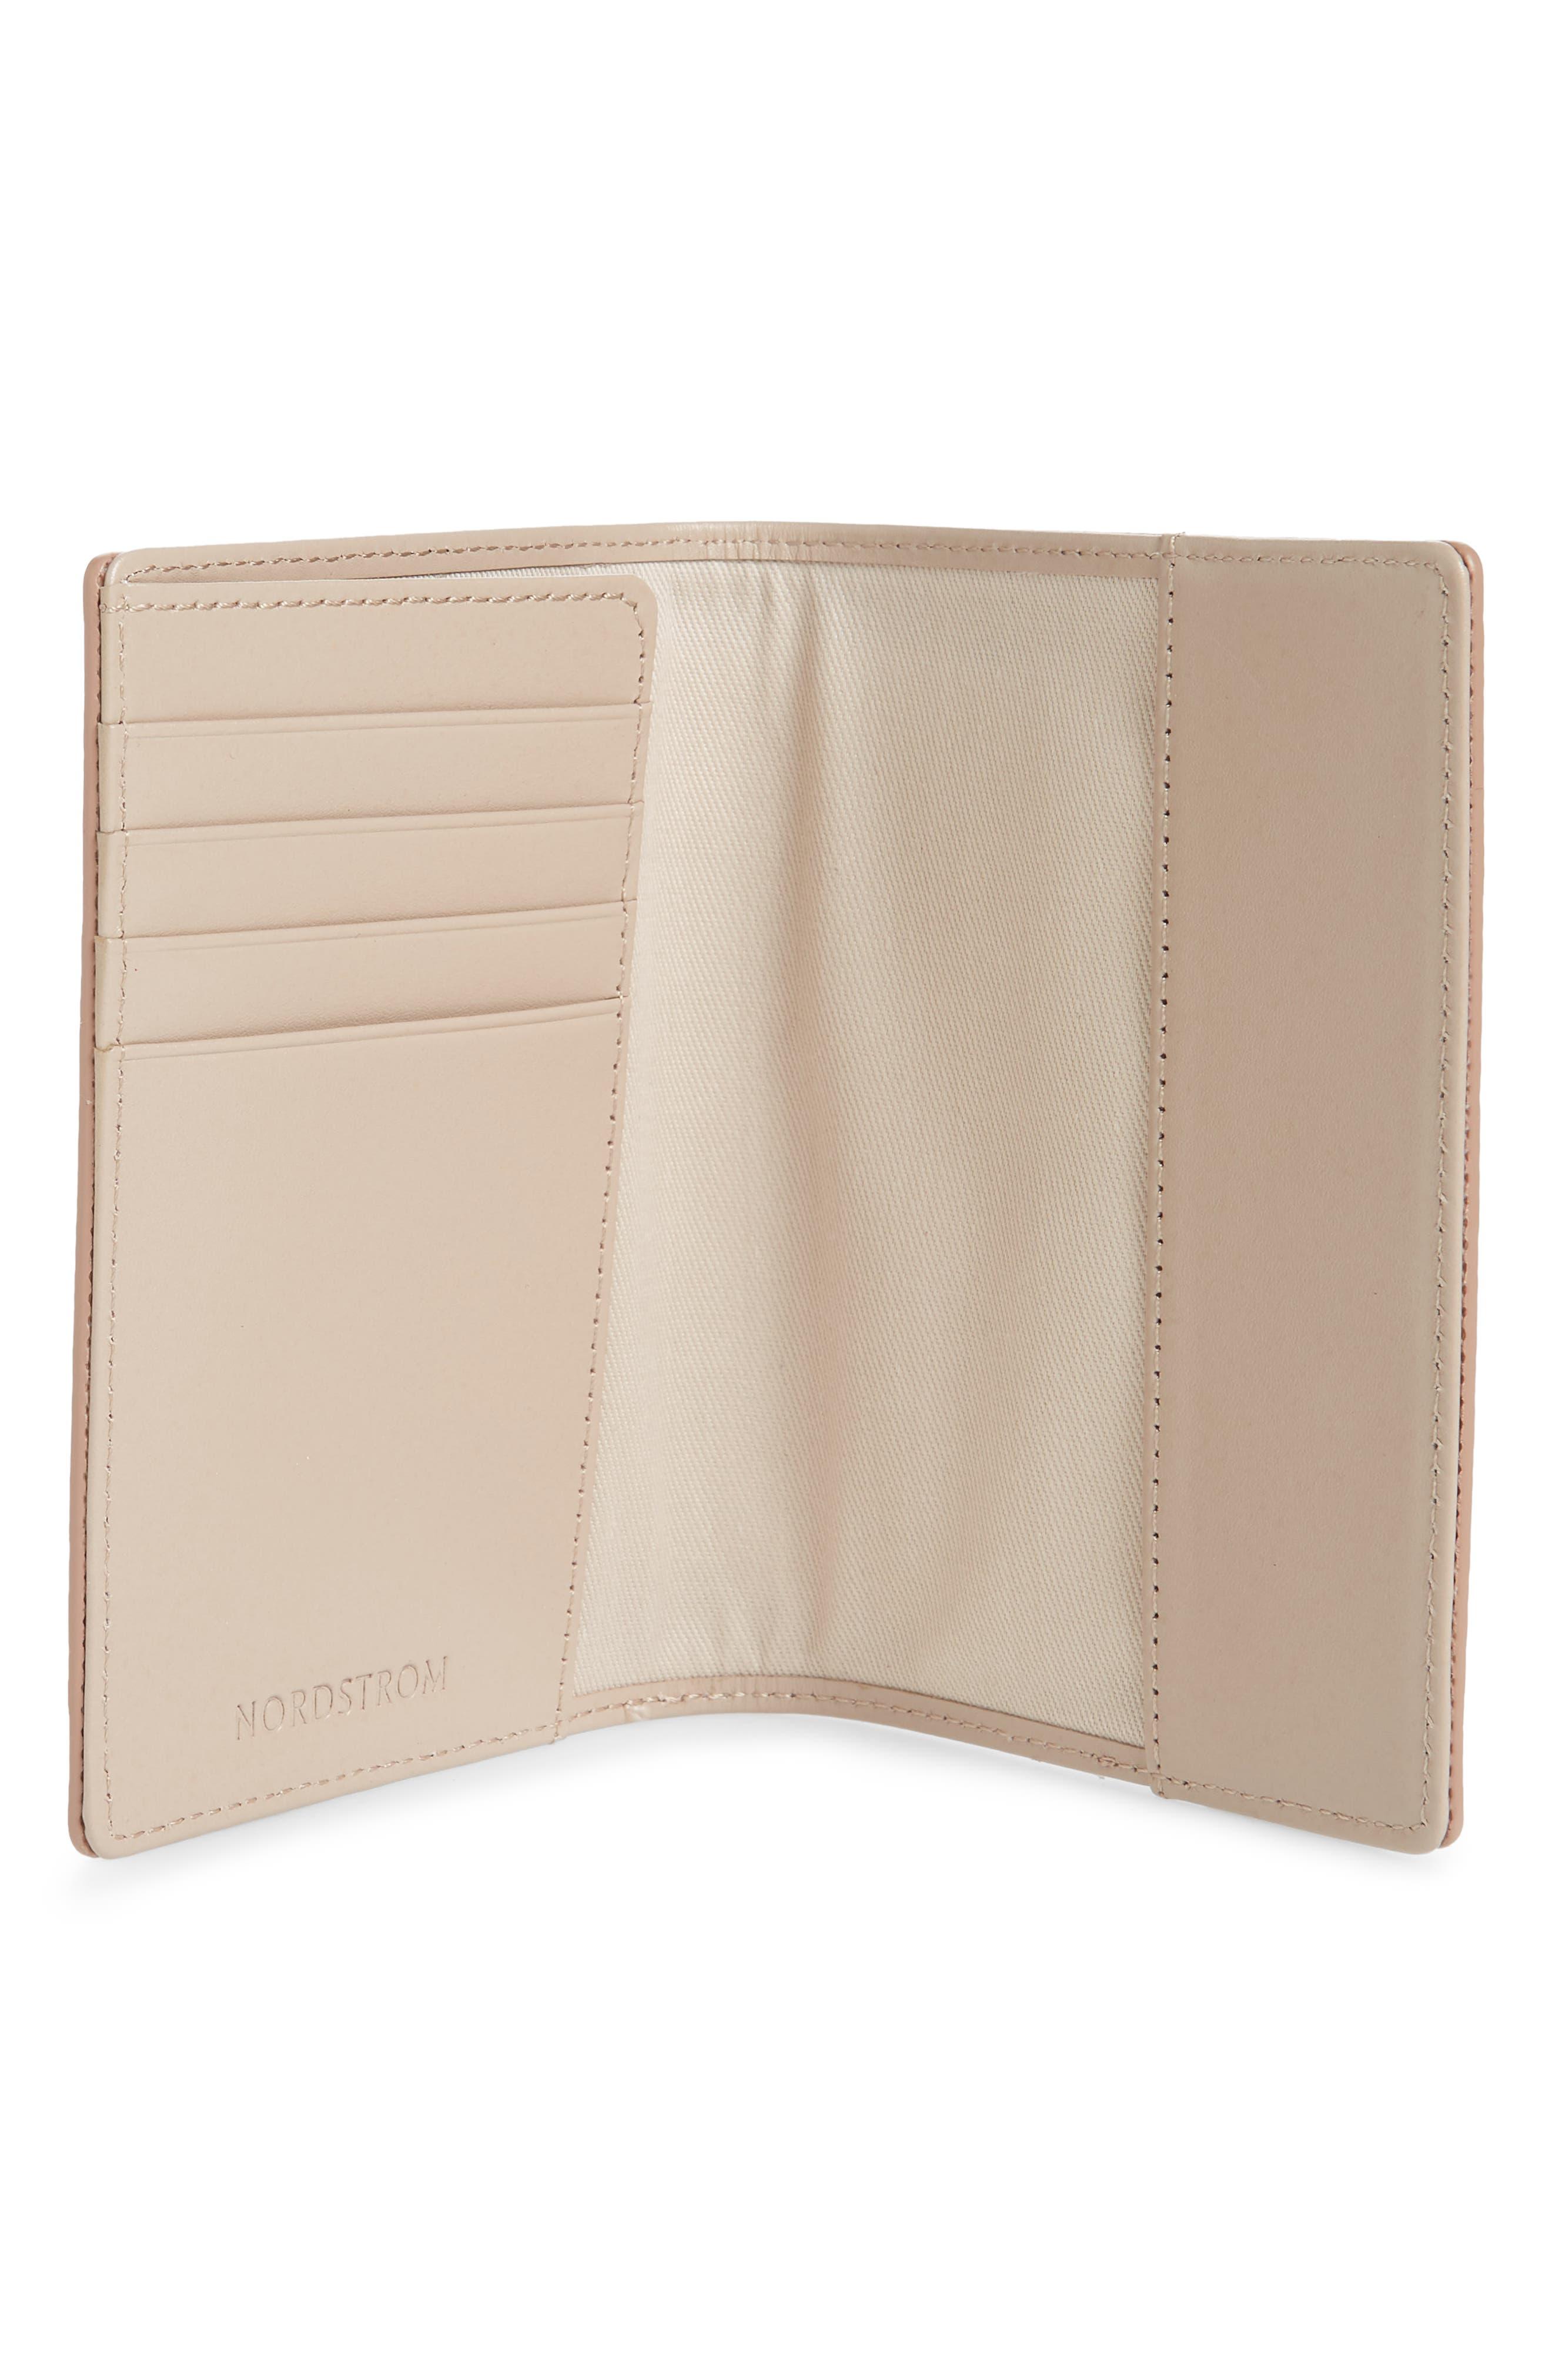 Leather Passport Case,                             Alternate thumbnail 2, color,                             ROSE GOLD